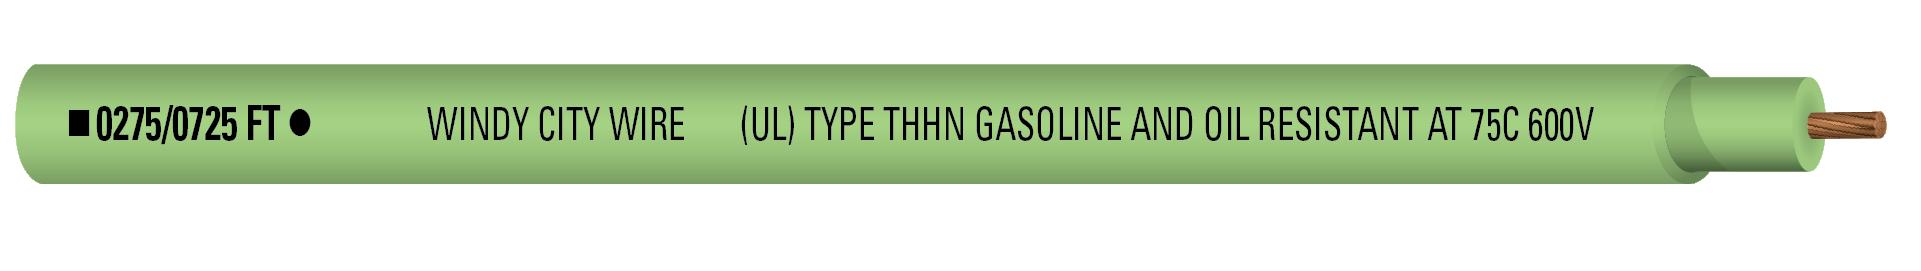 14-1C STR THHN 600V Grn